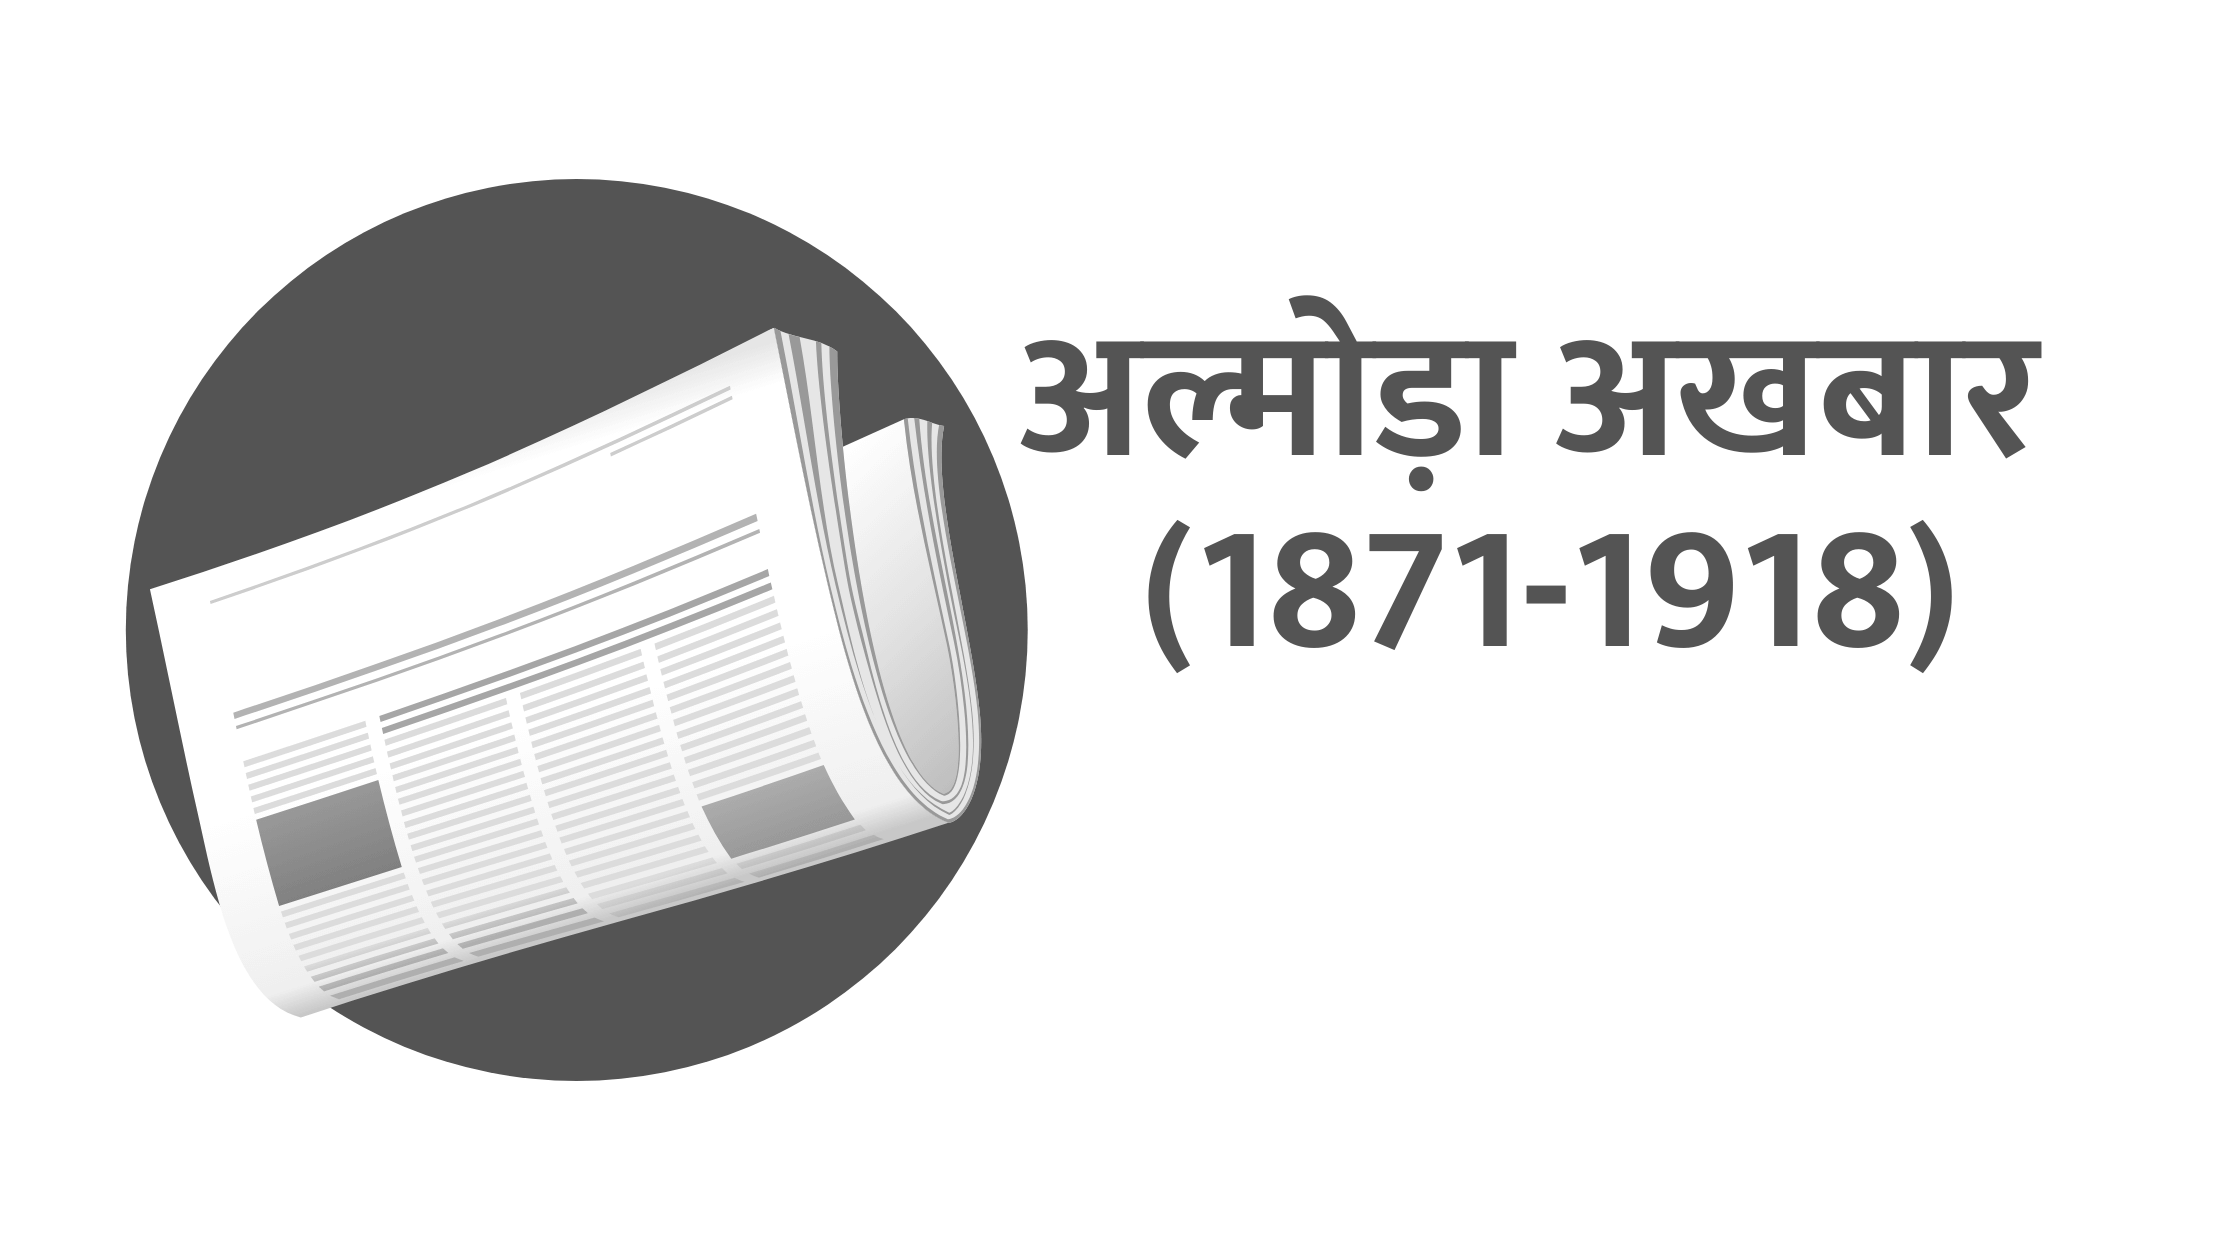 अल्मोड़ा अखबार (1871-1918)